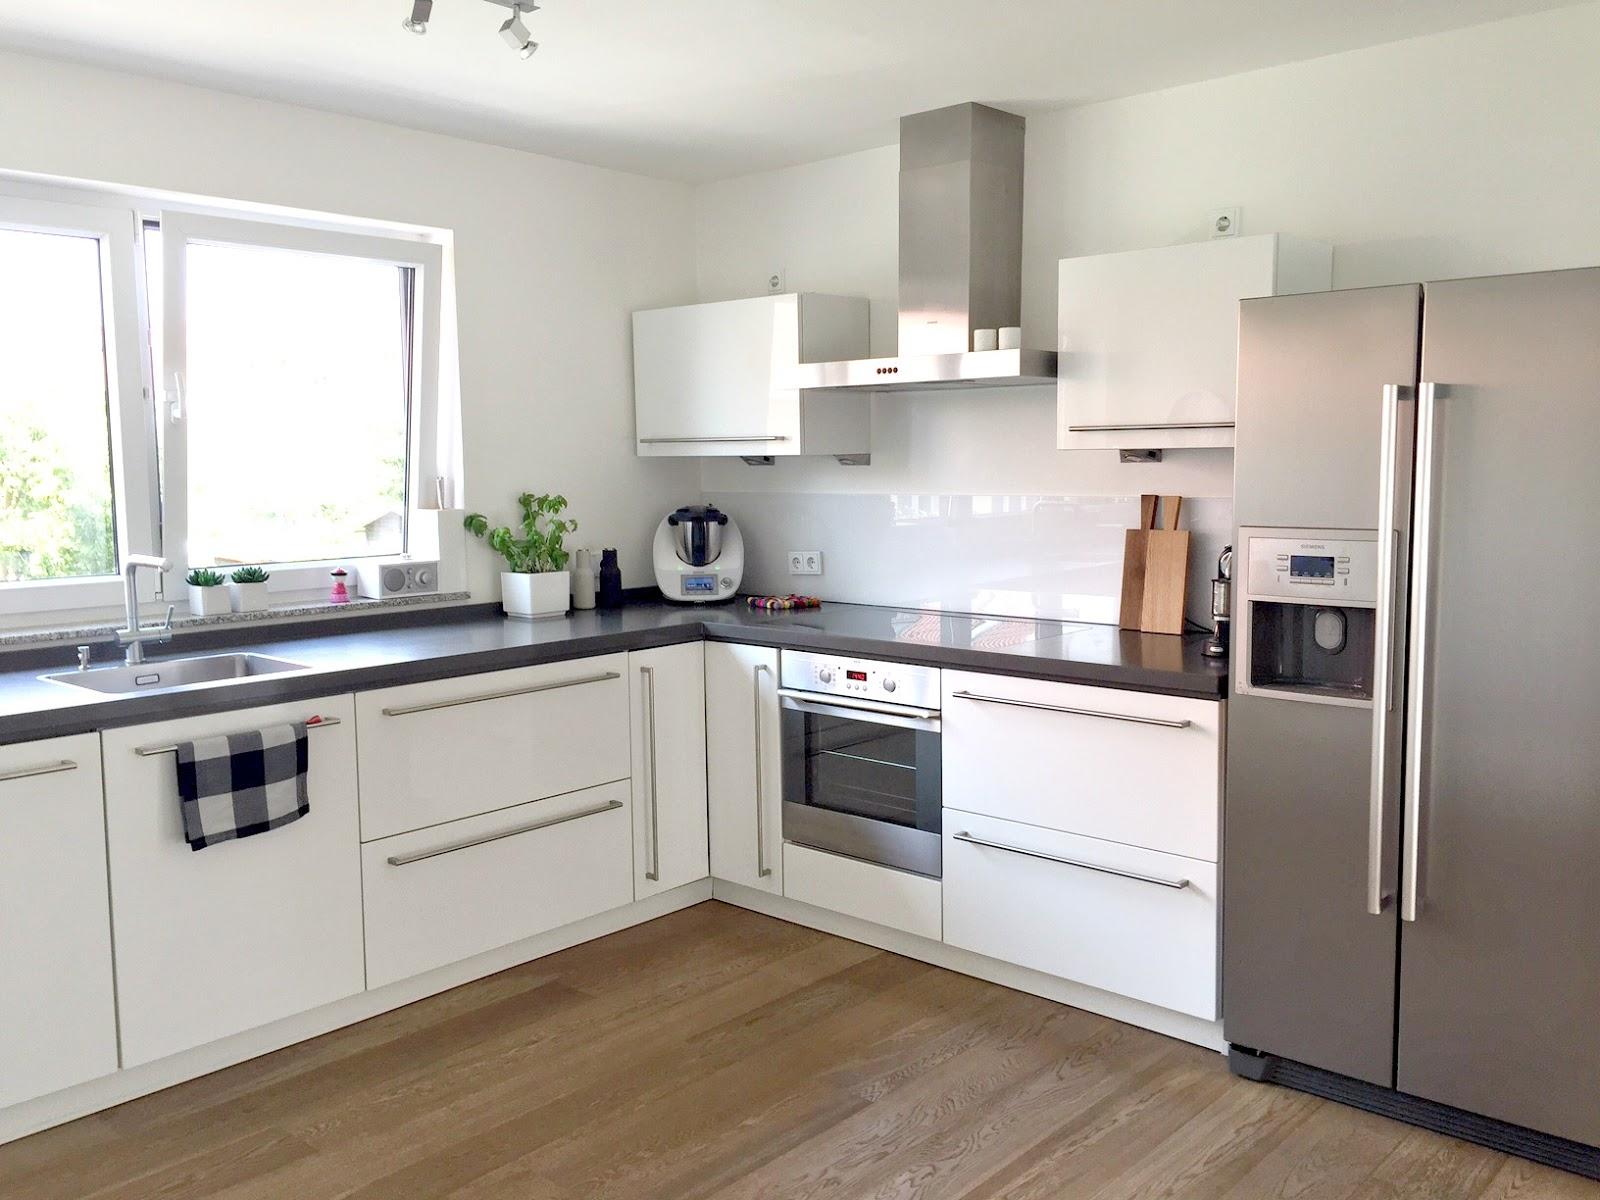 küche putzen motivation ~ Logisting.com = Varie Forme di Mobili ...